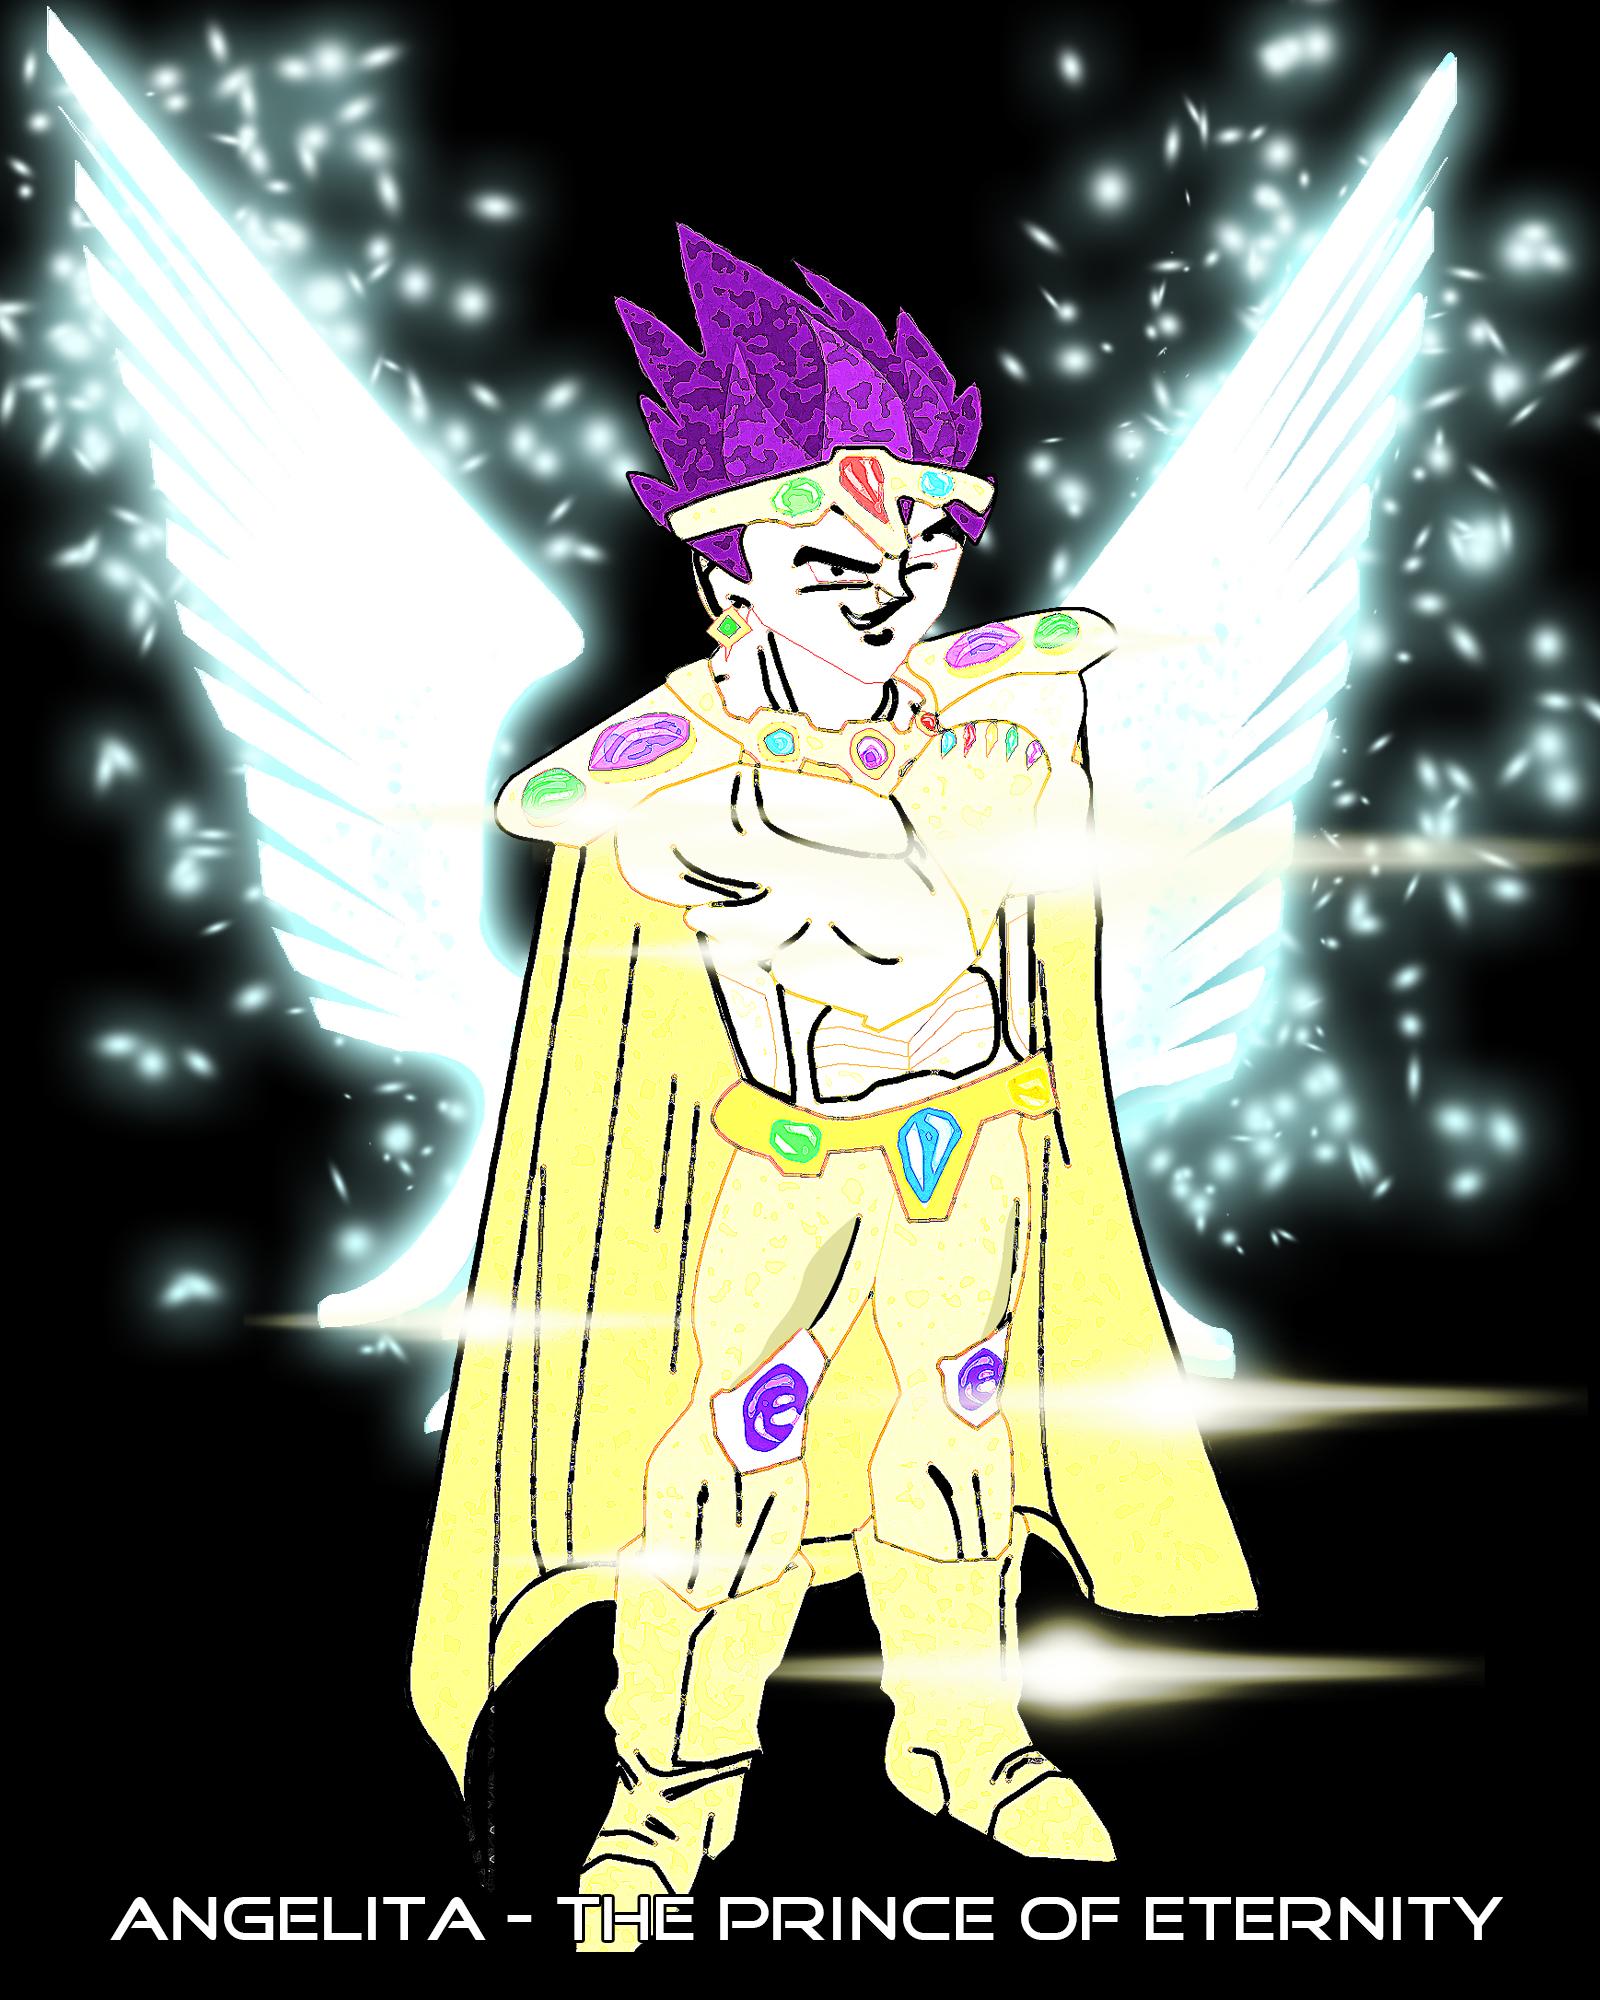 Angelita - Prince of Eternity